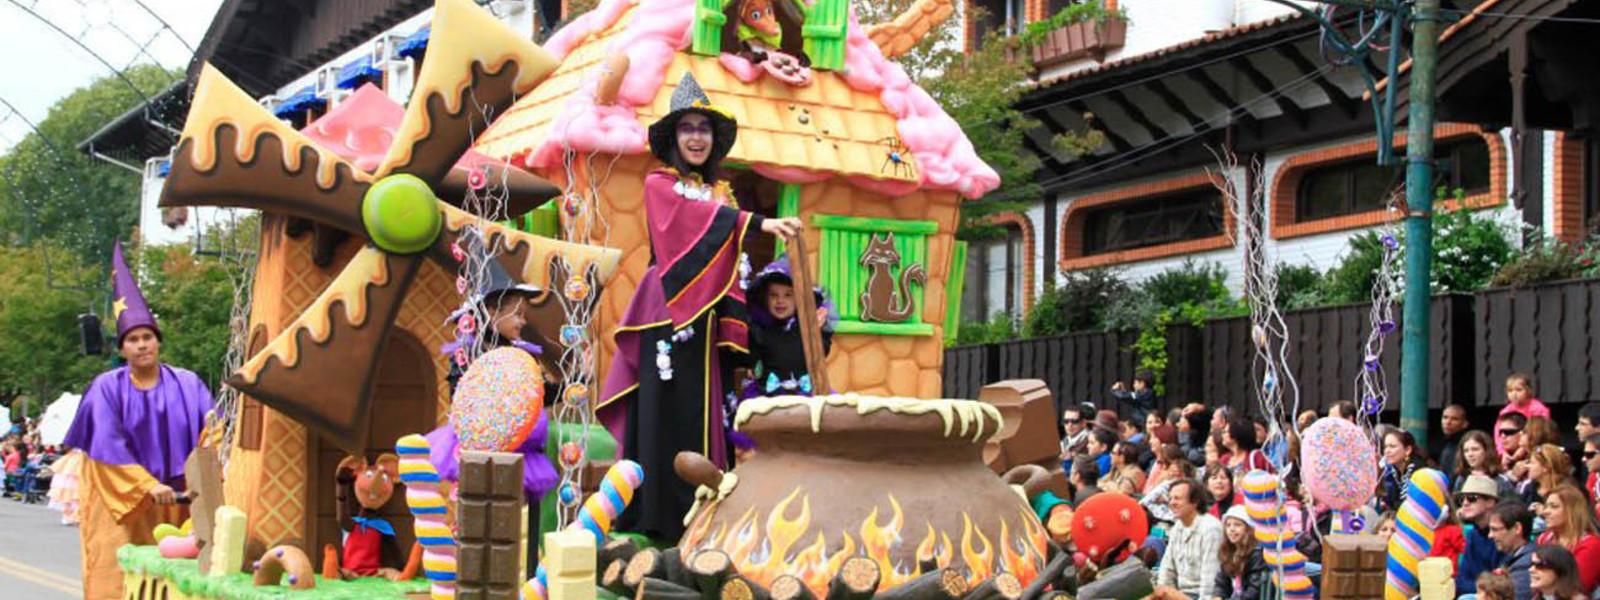 Chocofest Gramado